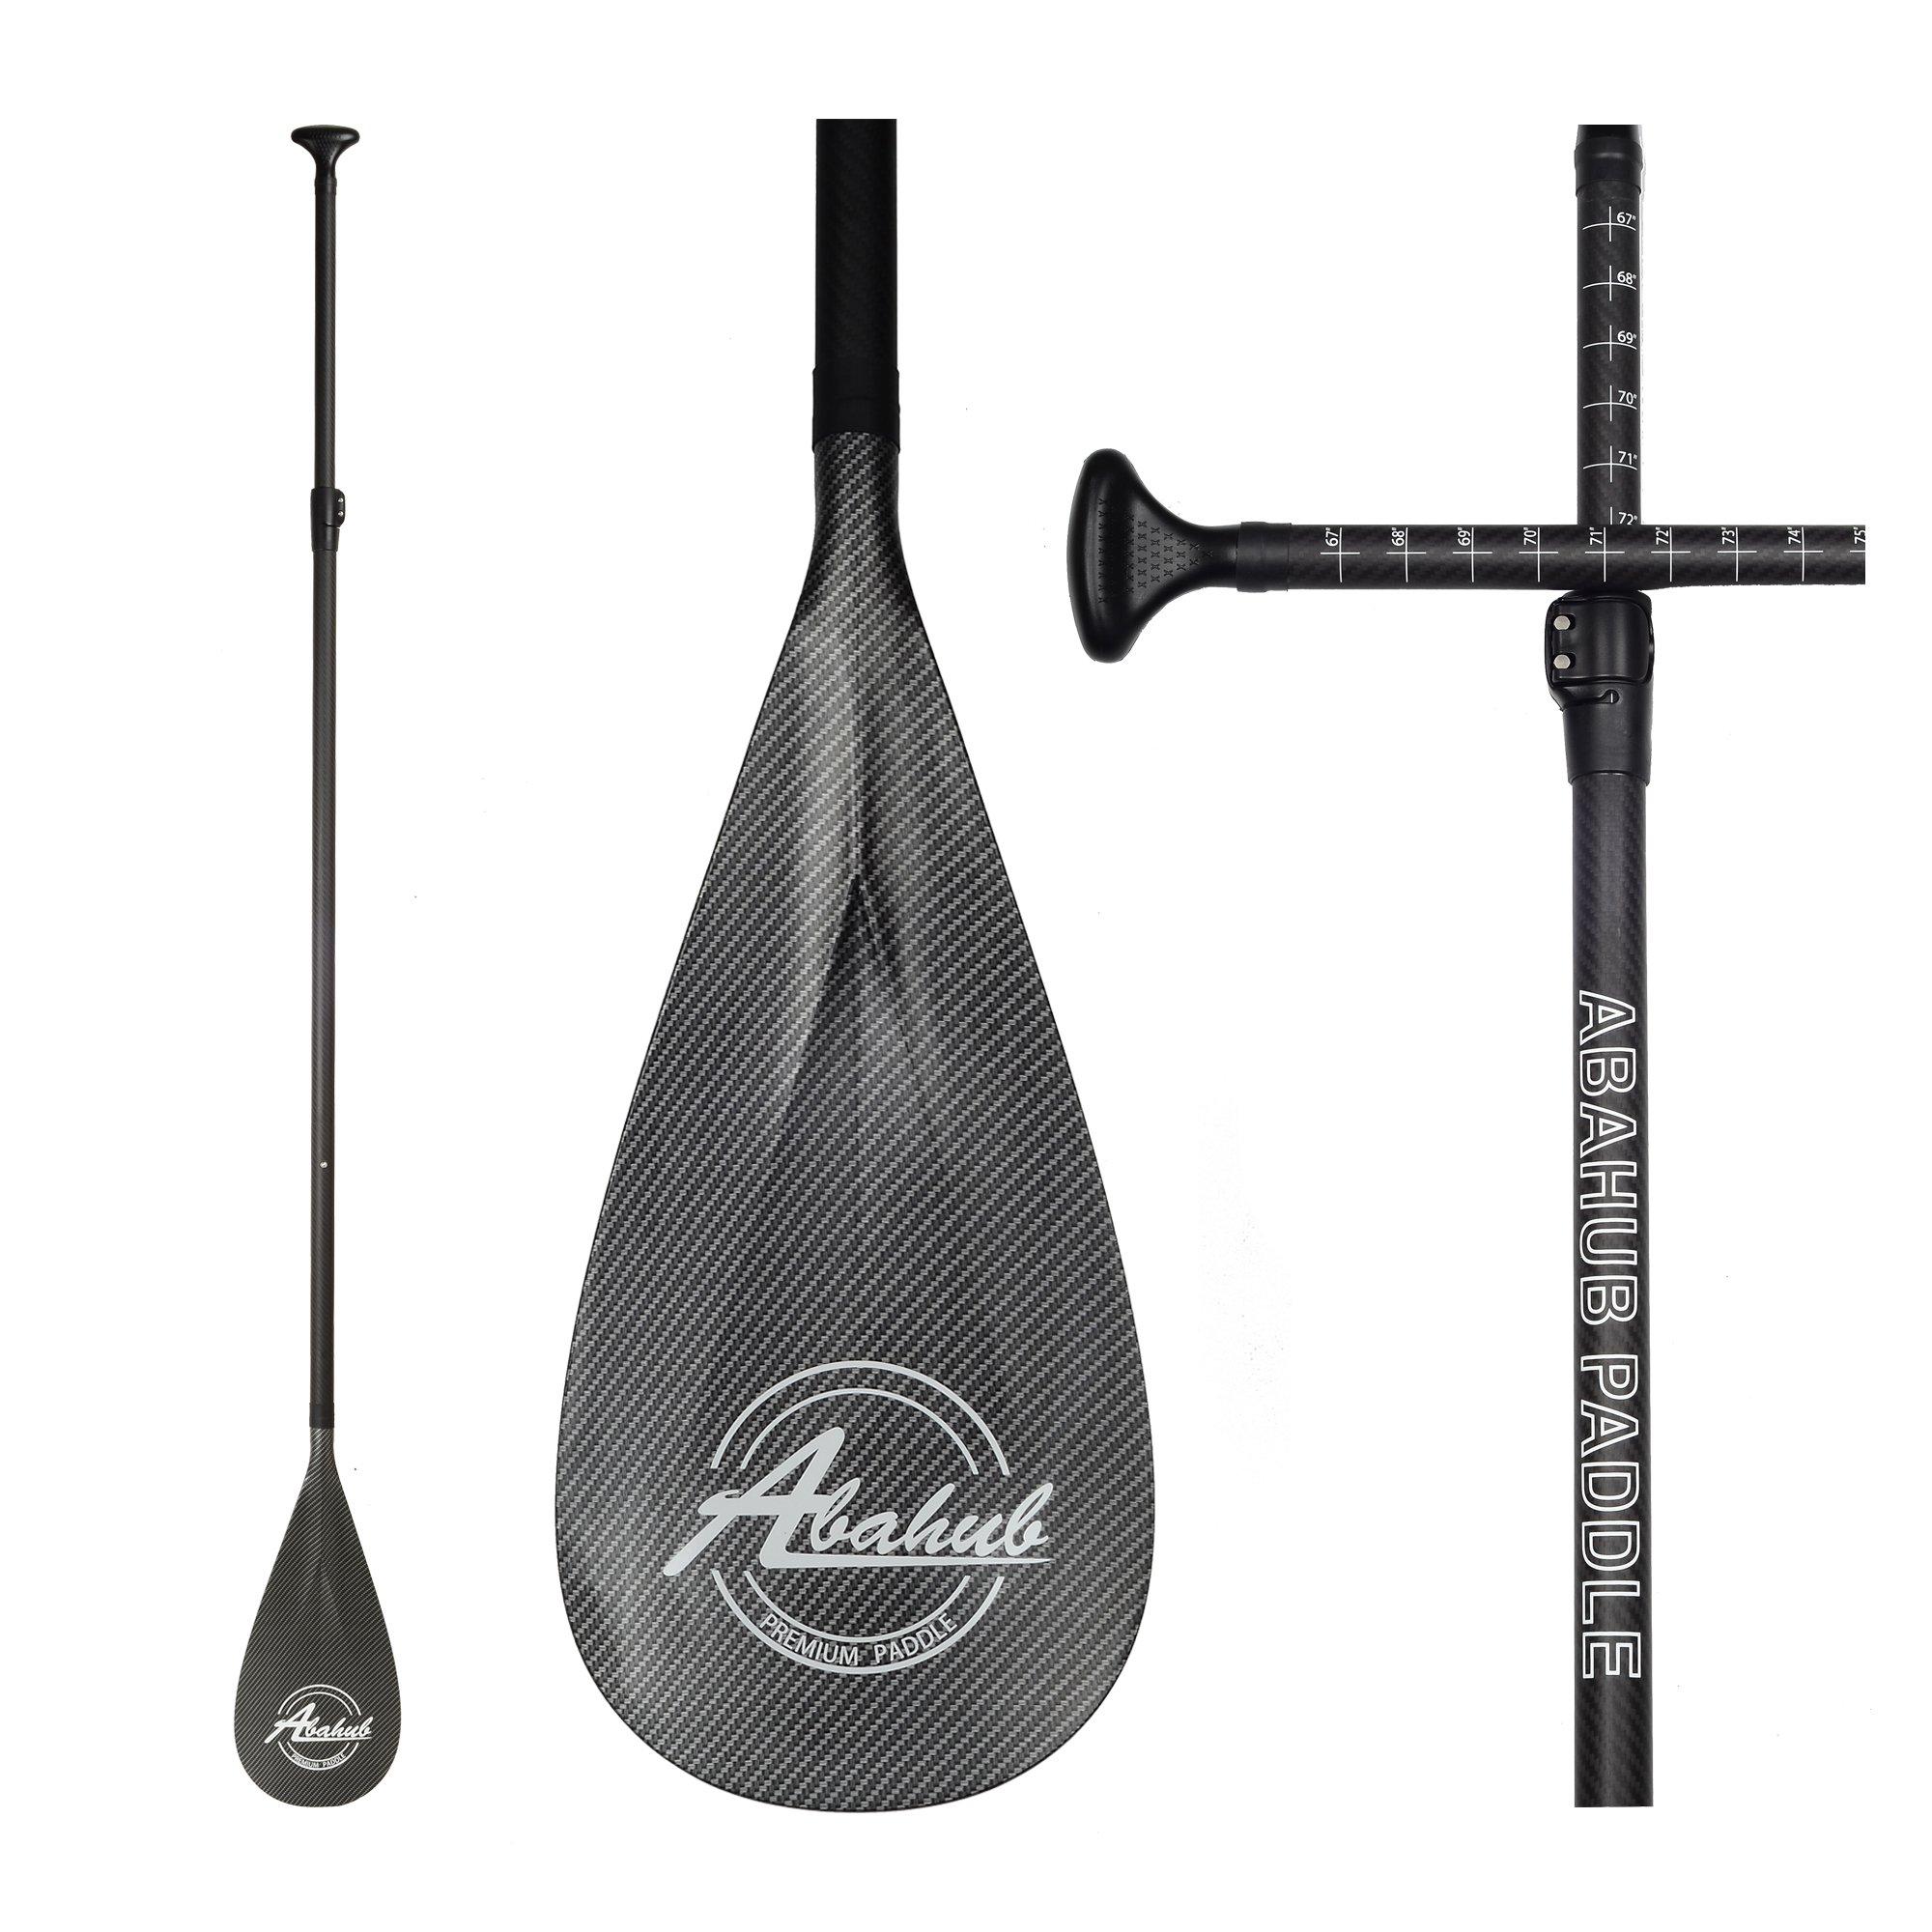 ABAHUB 3-Piece Adjustable Carbon Fiber SUP Paddle Carbon Shaft Carbon Print Plastic Blade + Bag by ABAHUB (Image #1)